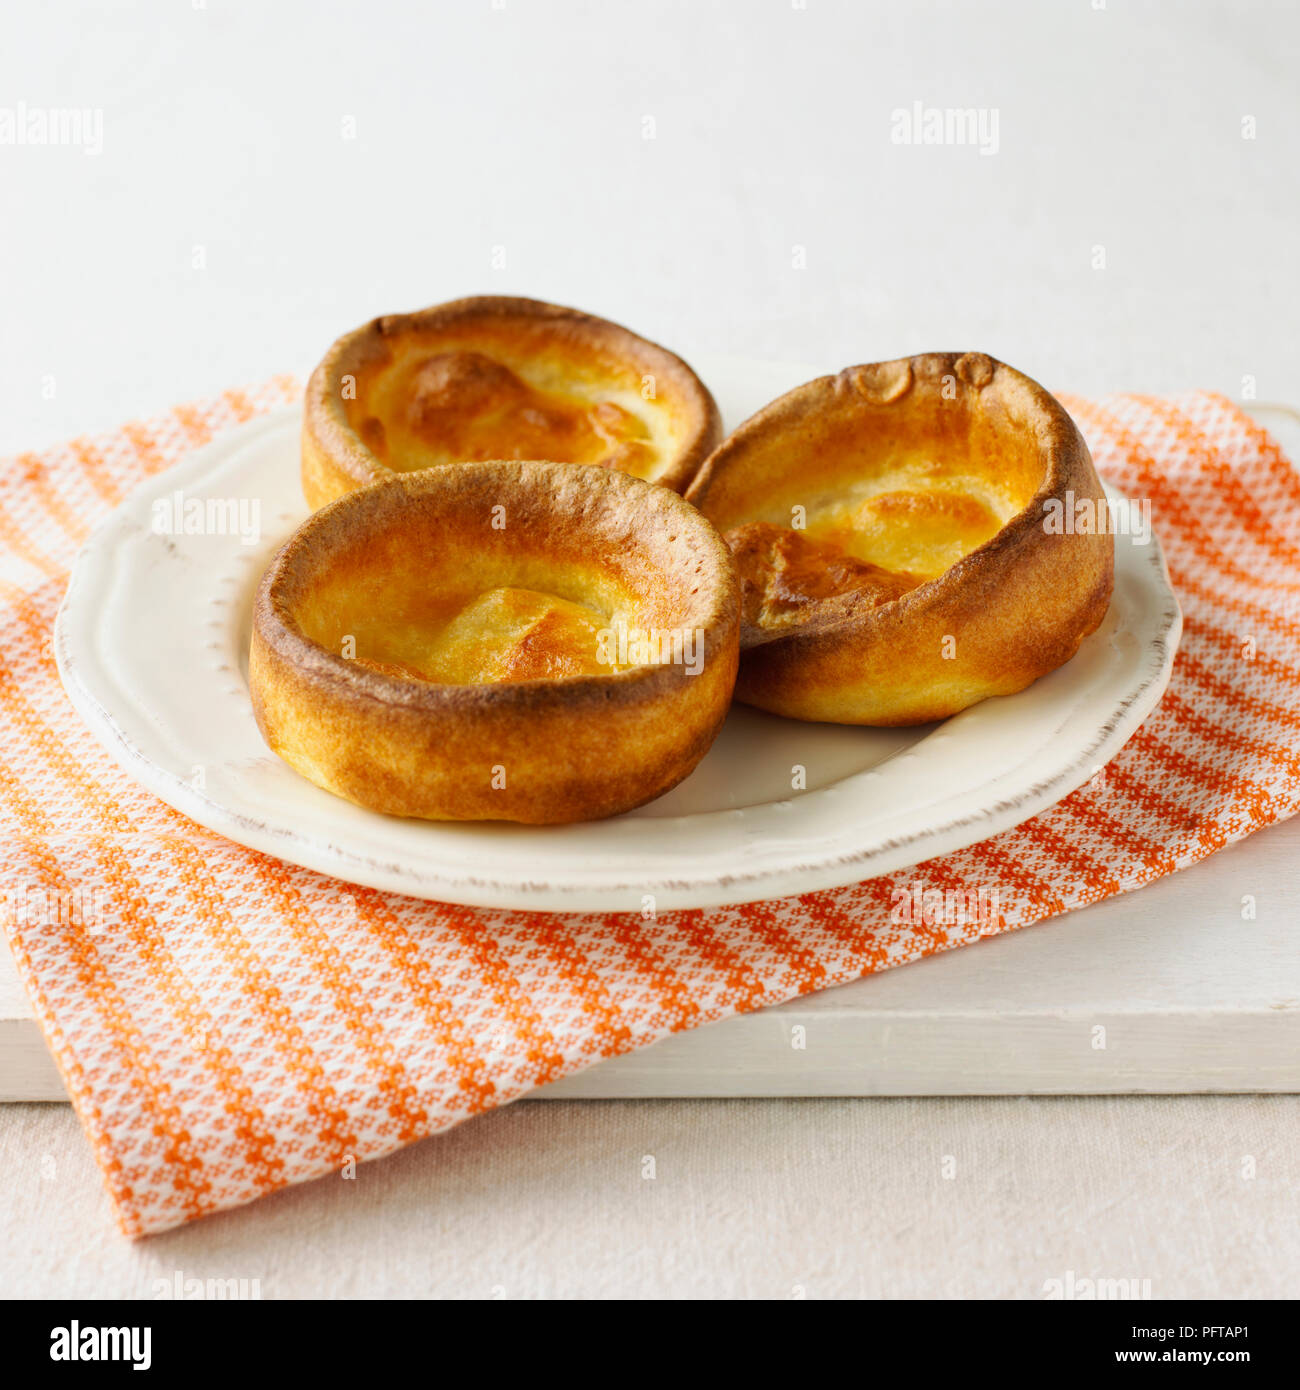 Yorkshire puddings Photo Stock